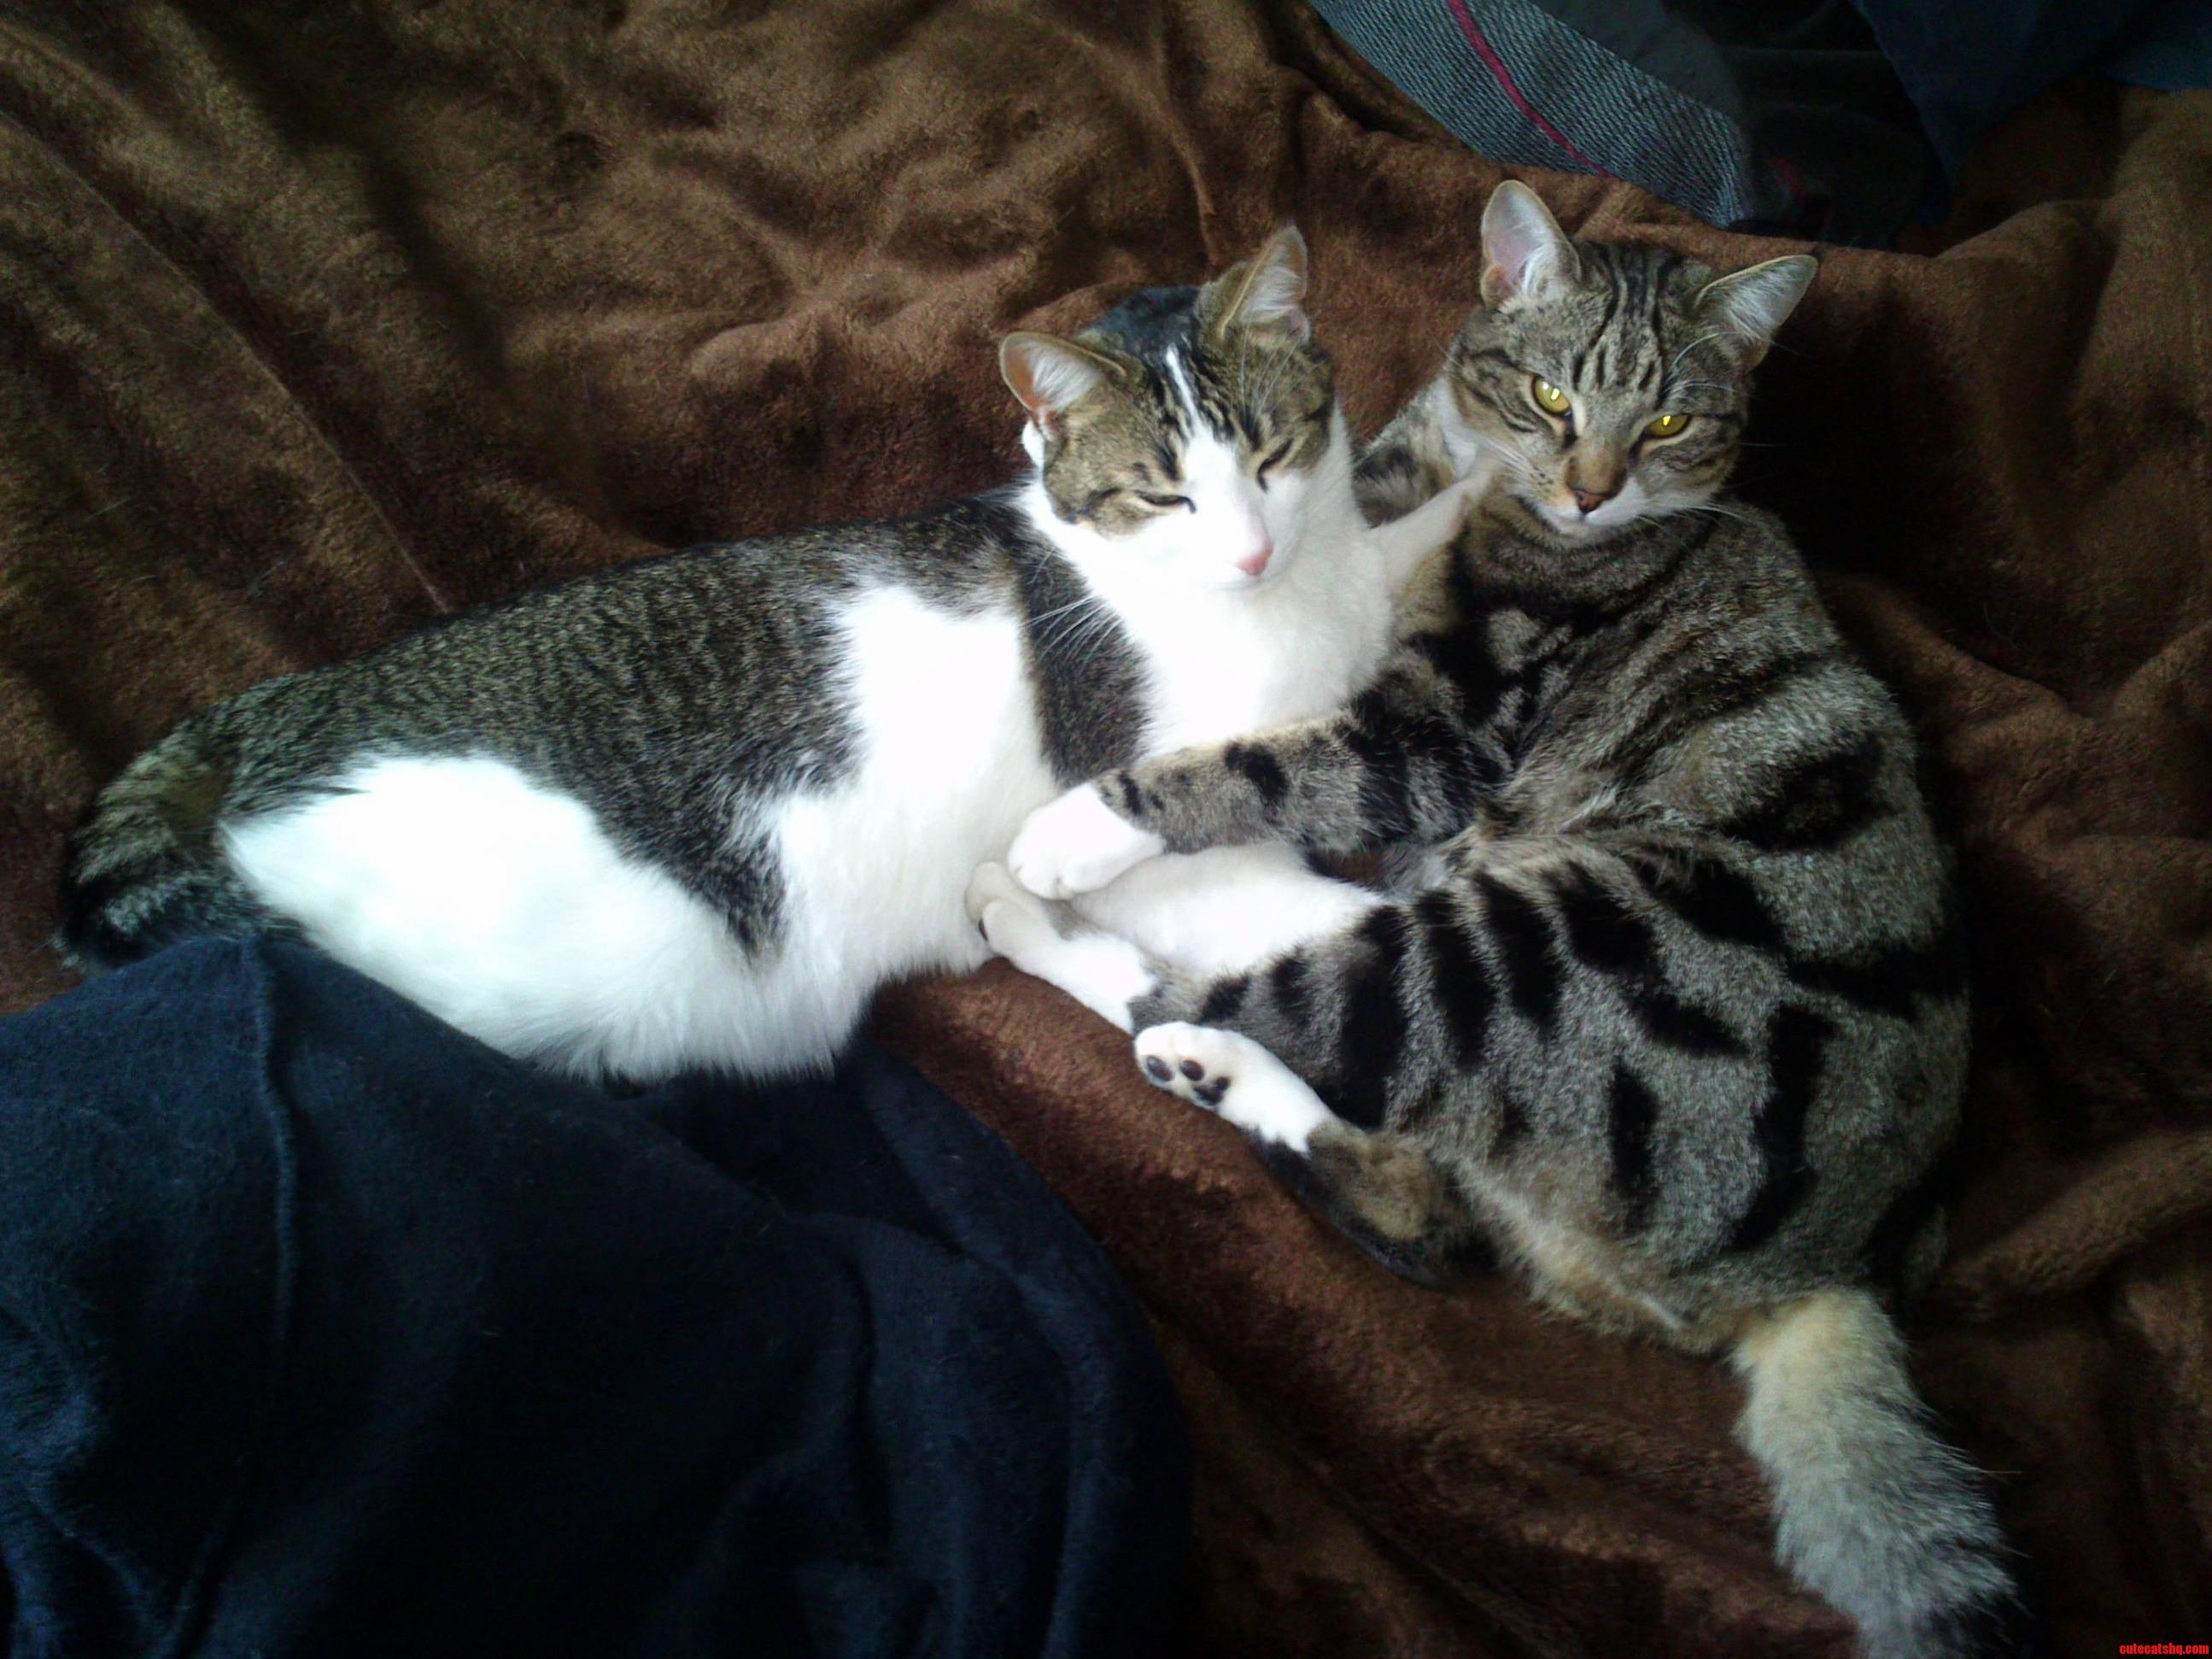 Cuddles kitty